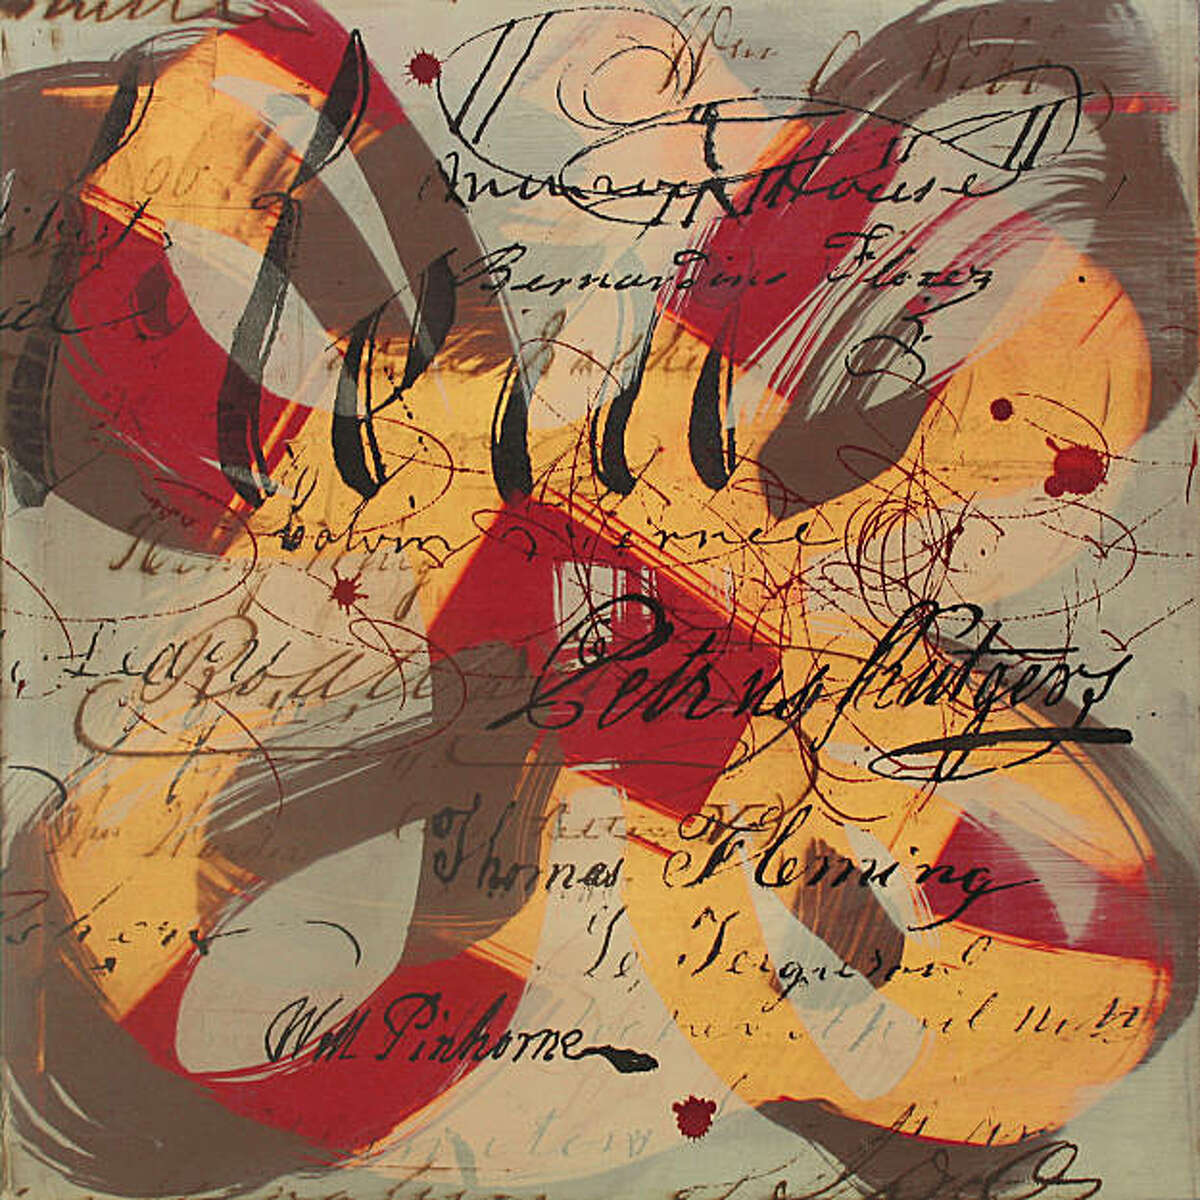 """Moniker 17 (Florez)"" (2009) oil on panel by Catherine Courtenaye 12"" x 12"""